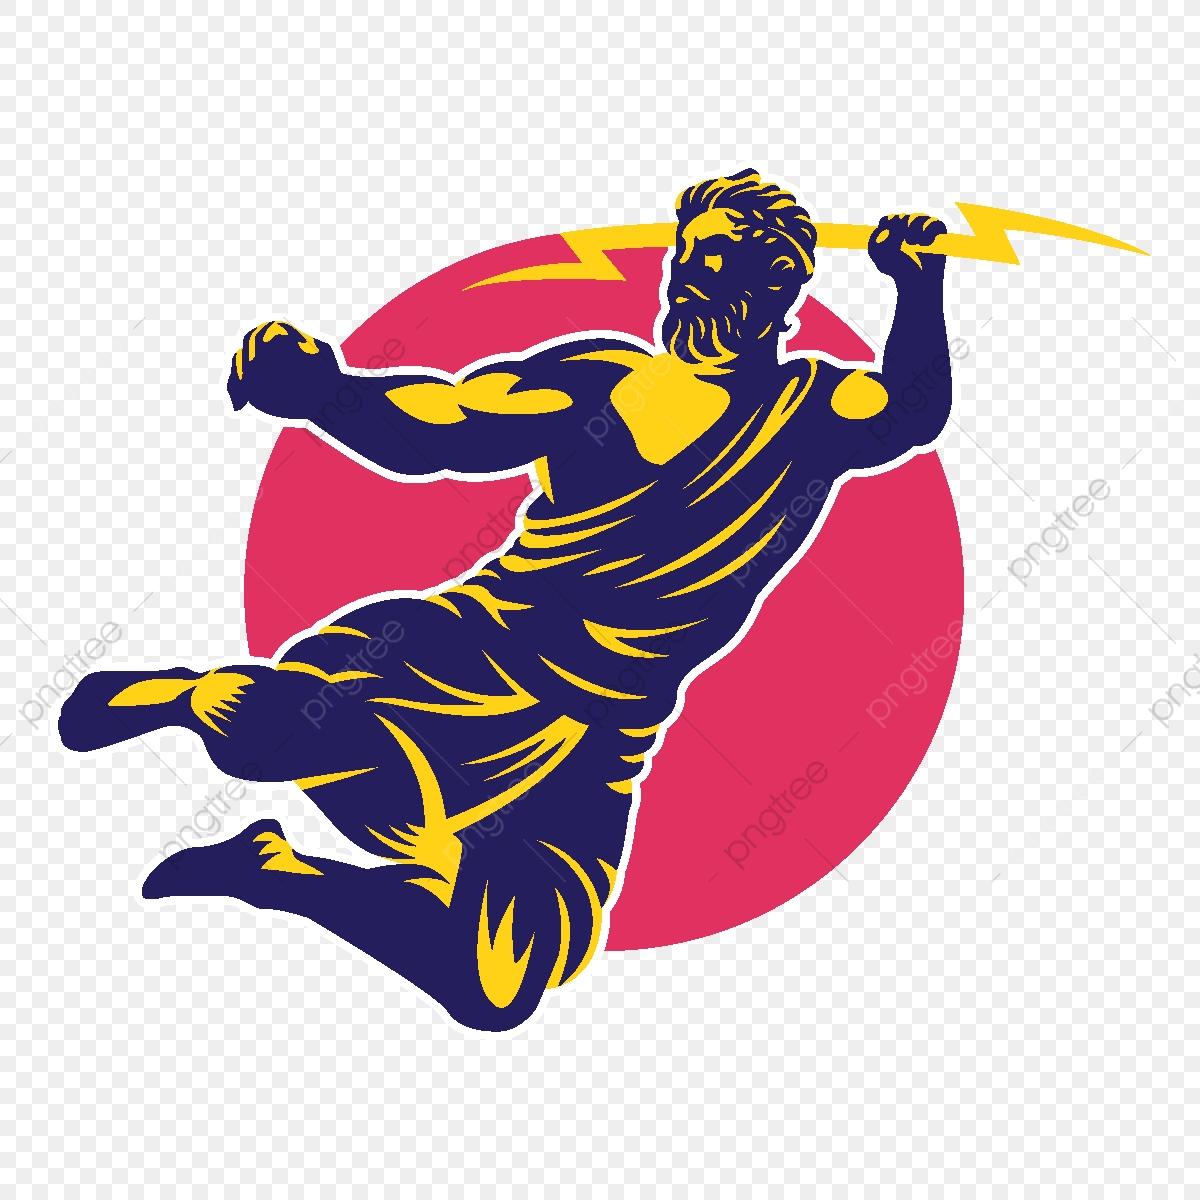 Zeus Thunderbolt Gods Mascot Logo Template, Design, Illustration.